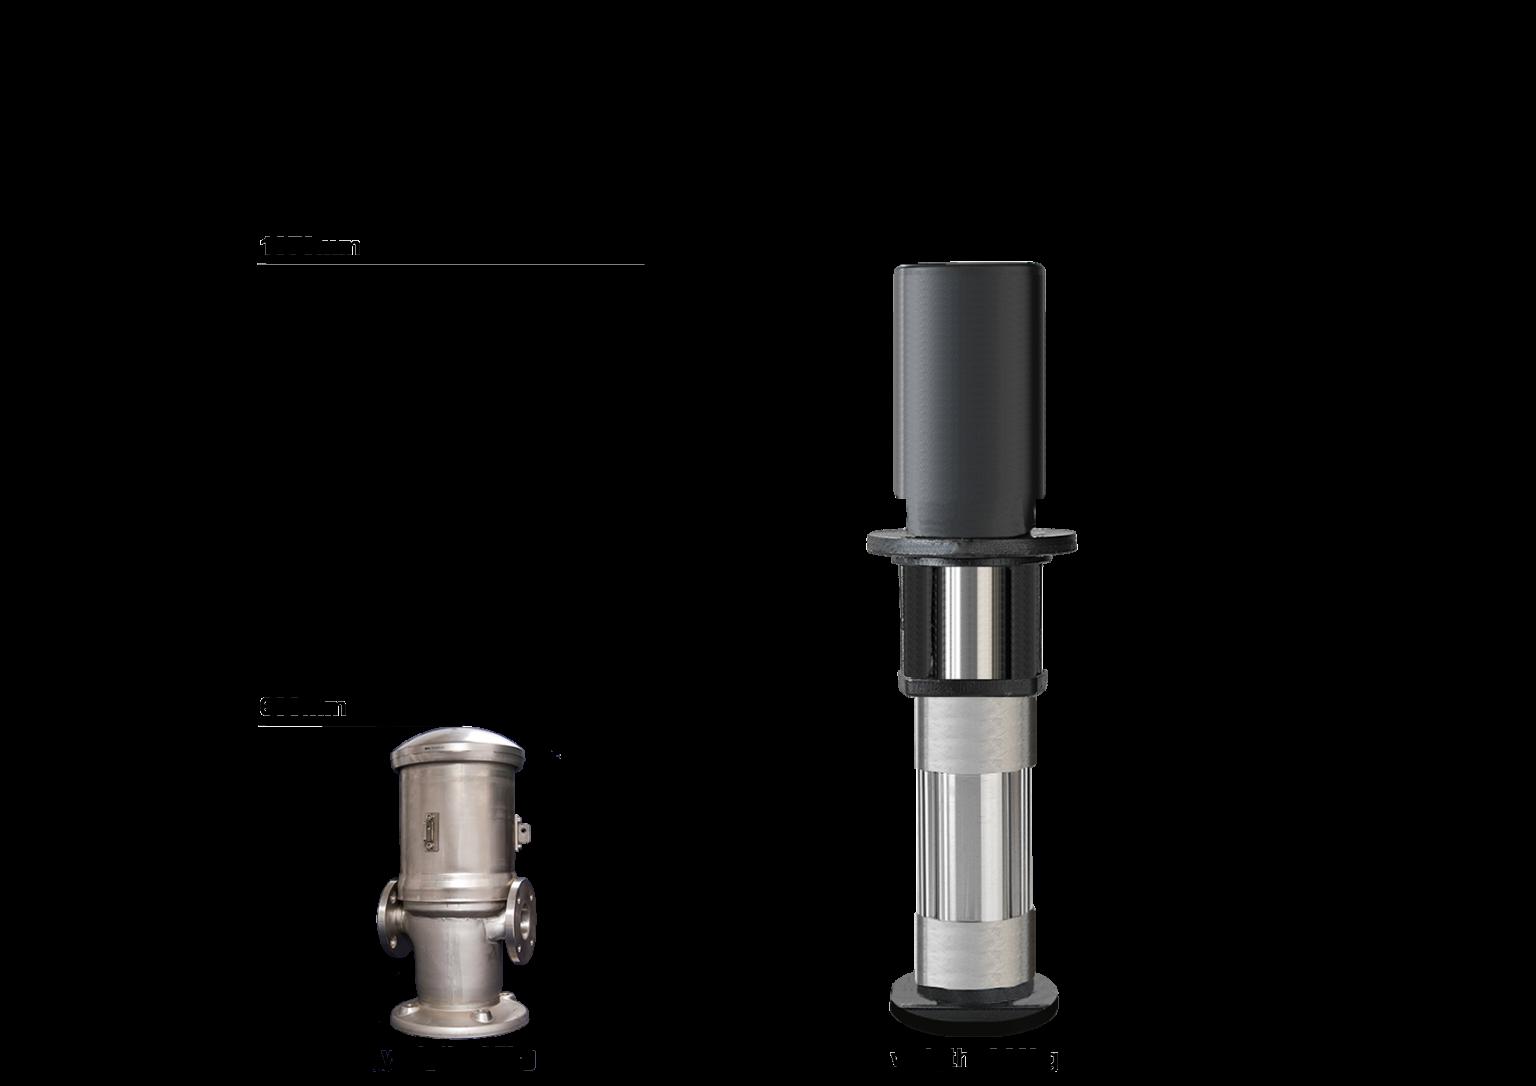 Radiax Pump comparison to conventional pump